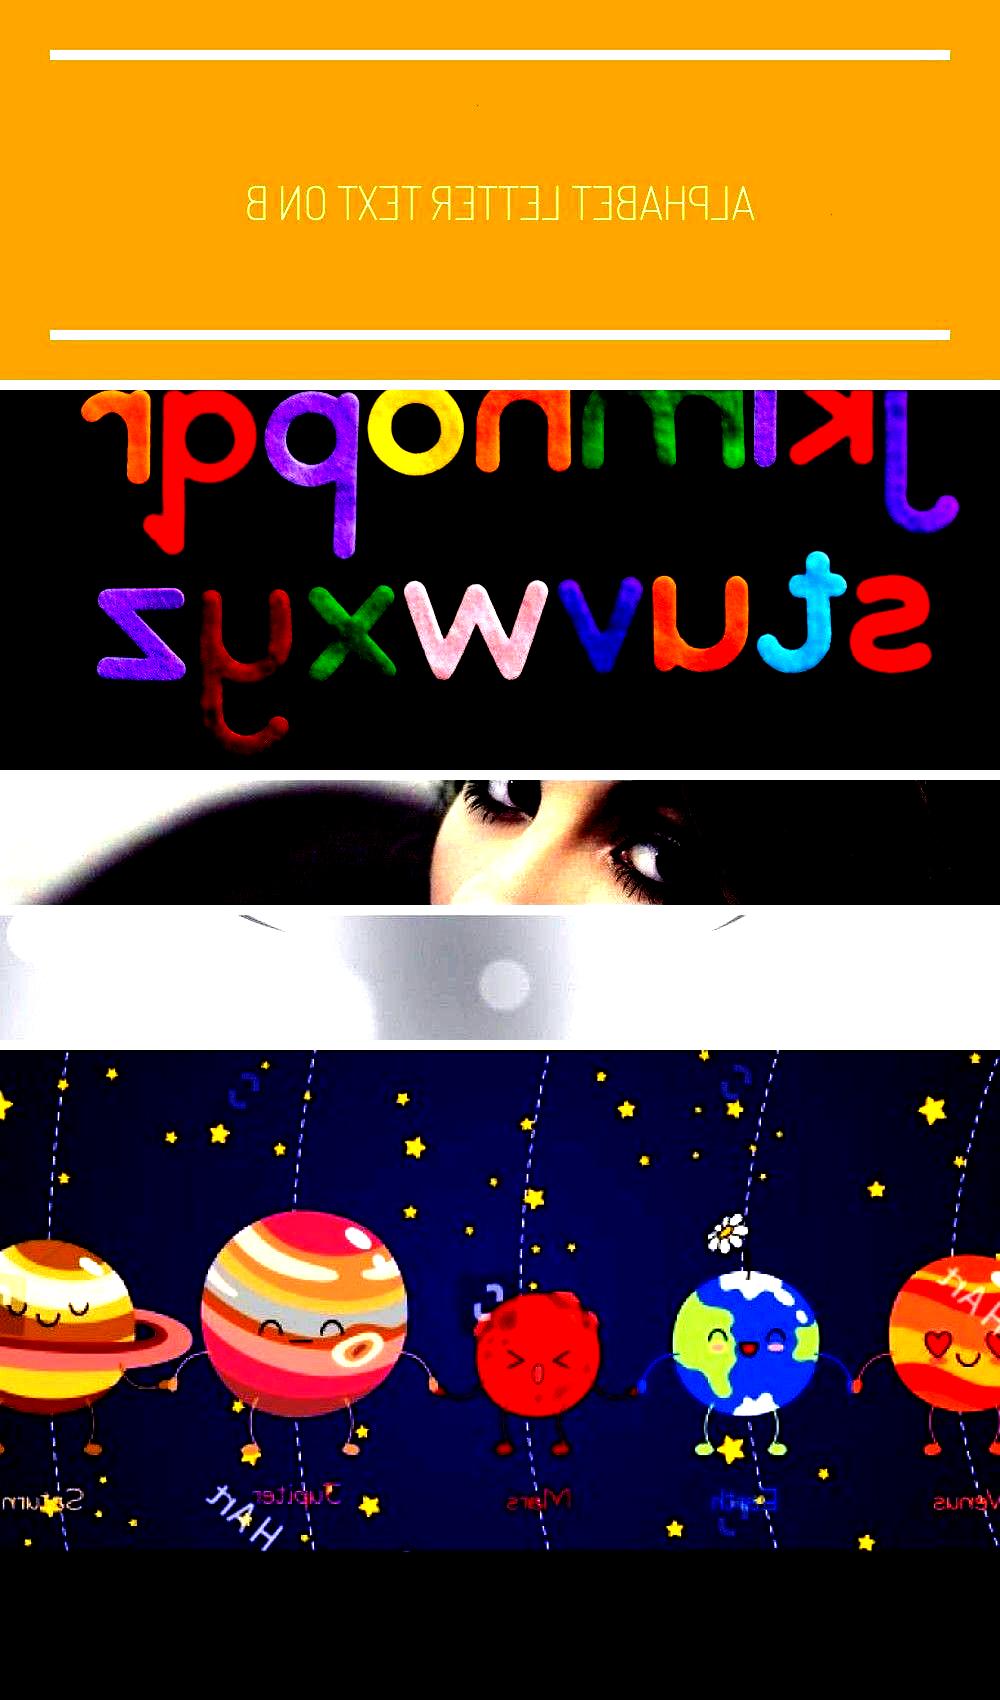 Illustration Hdwallpaper Backgrounds Conceptual Backgro In 2020 Colorful Wallpaper Wallpaper Backgrounds Conceptual